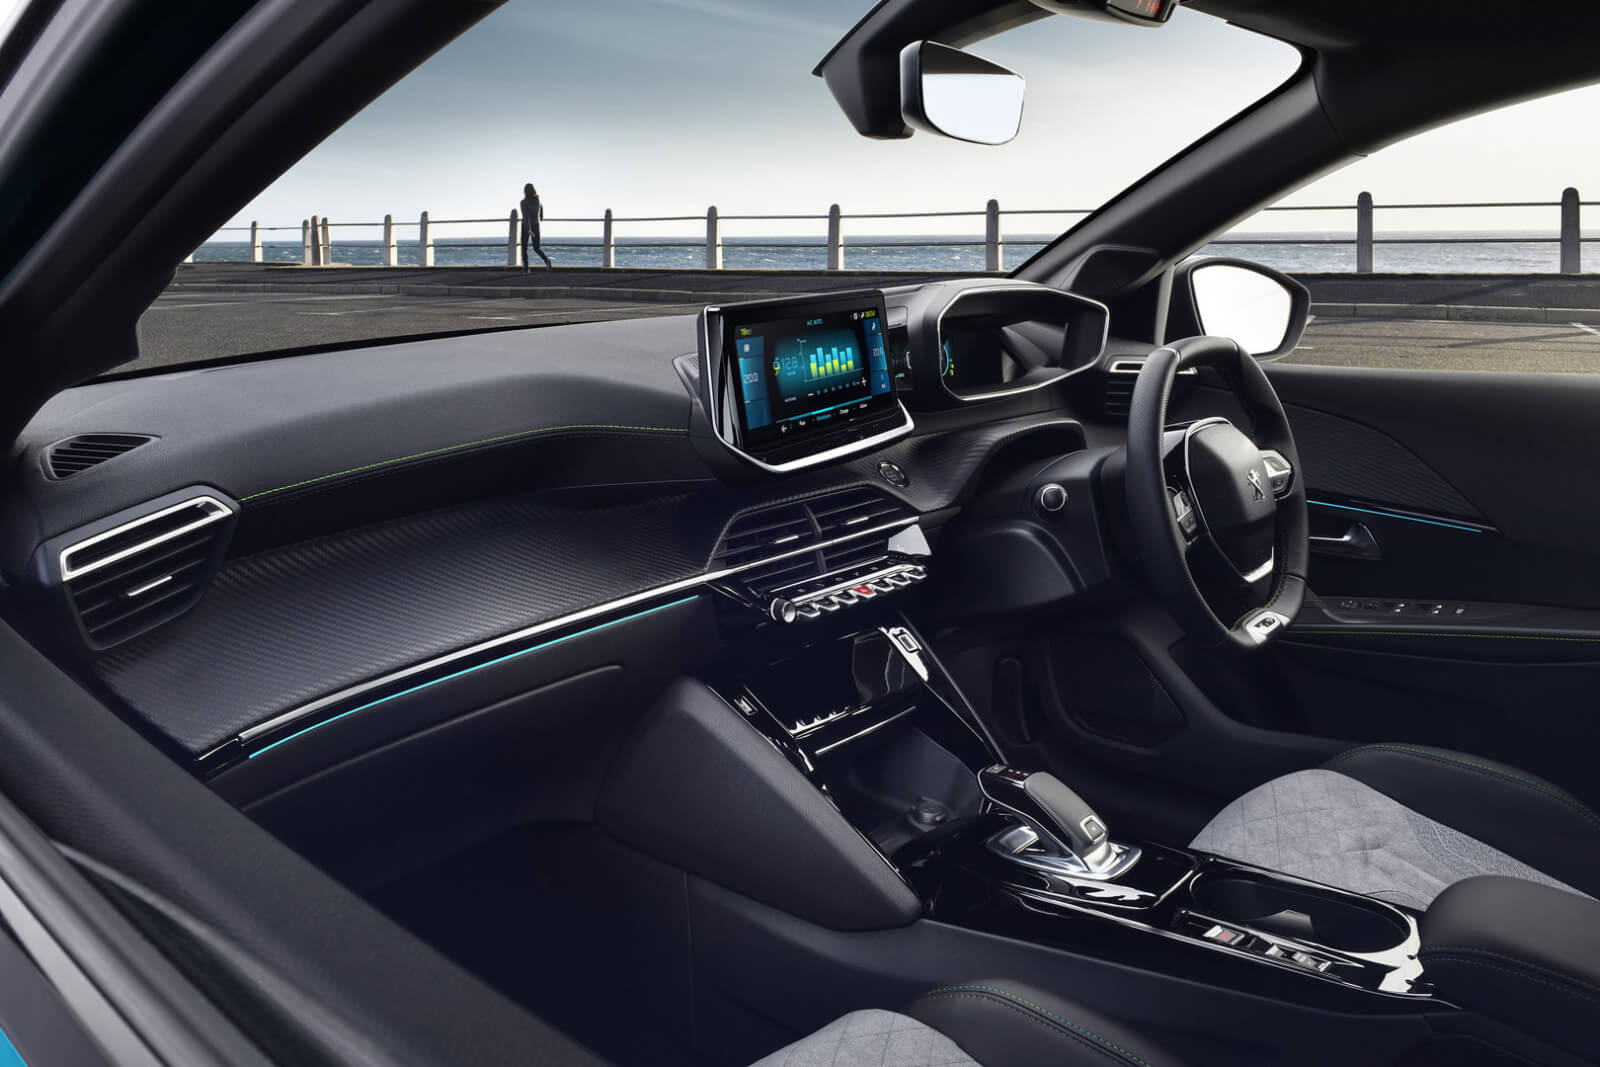 Peugeot e208 Range